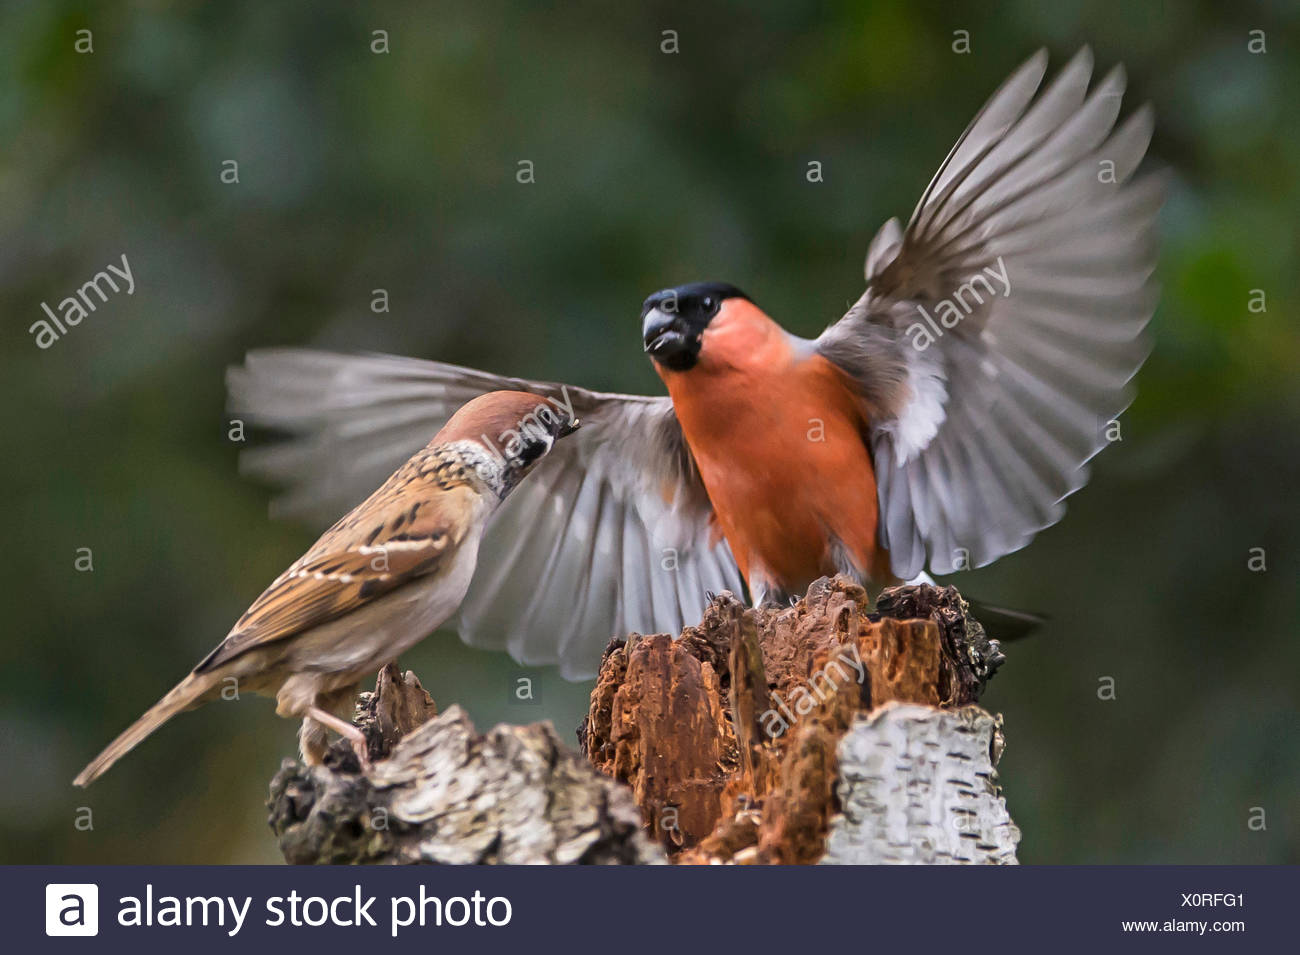 bullfinch, Eurasian bullfinch, northern bullfinch (Pyrrhula pyrrhula), fighting with field sparrow, Germany, North Rhine-Westphalia - Stock Image